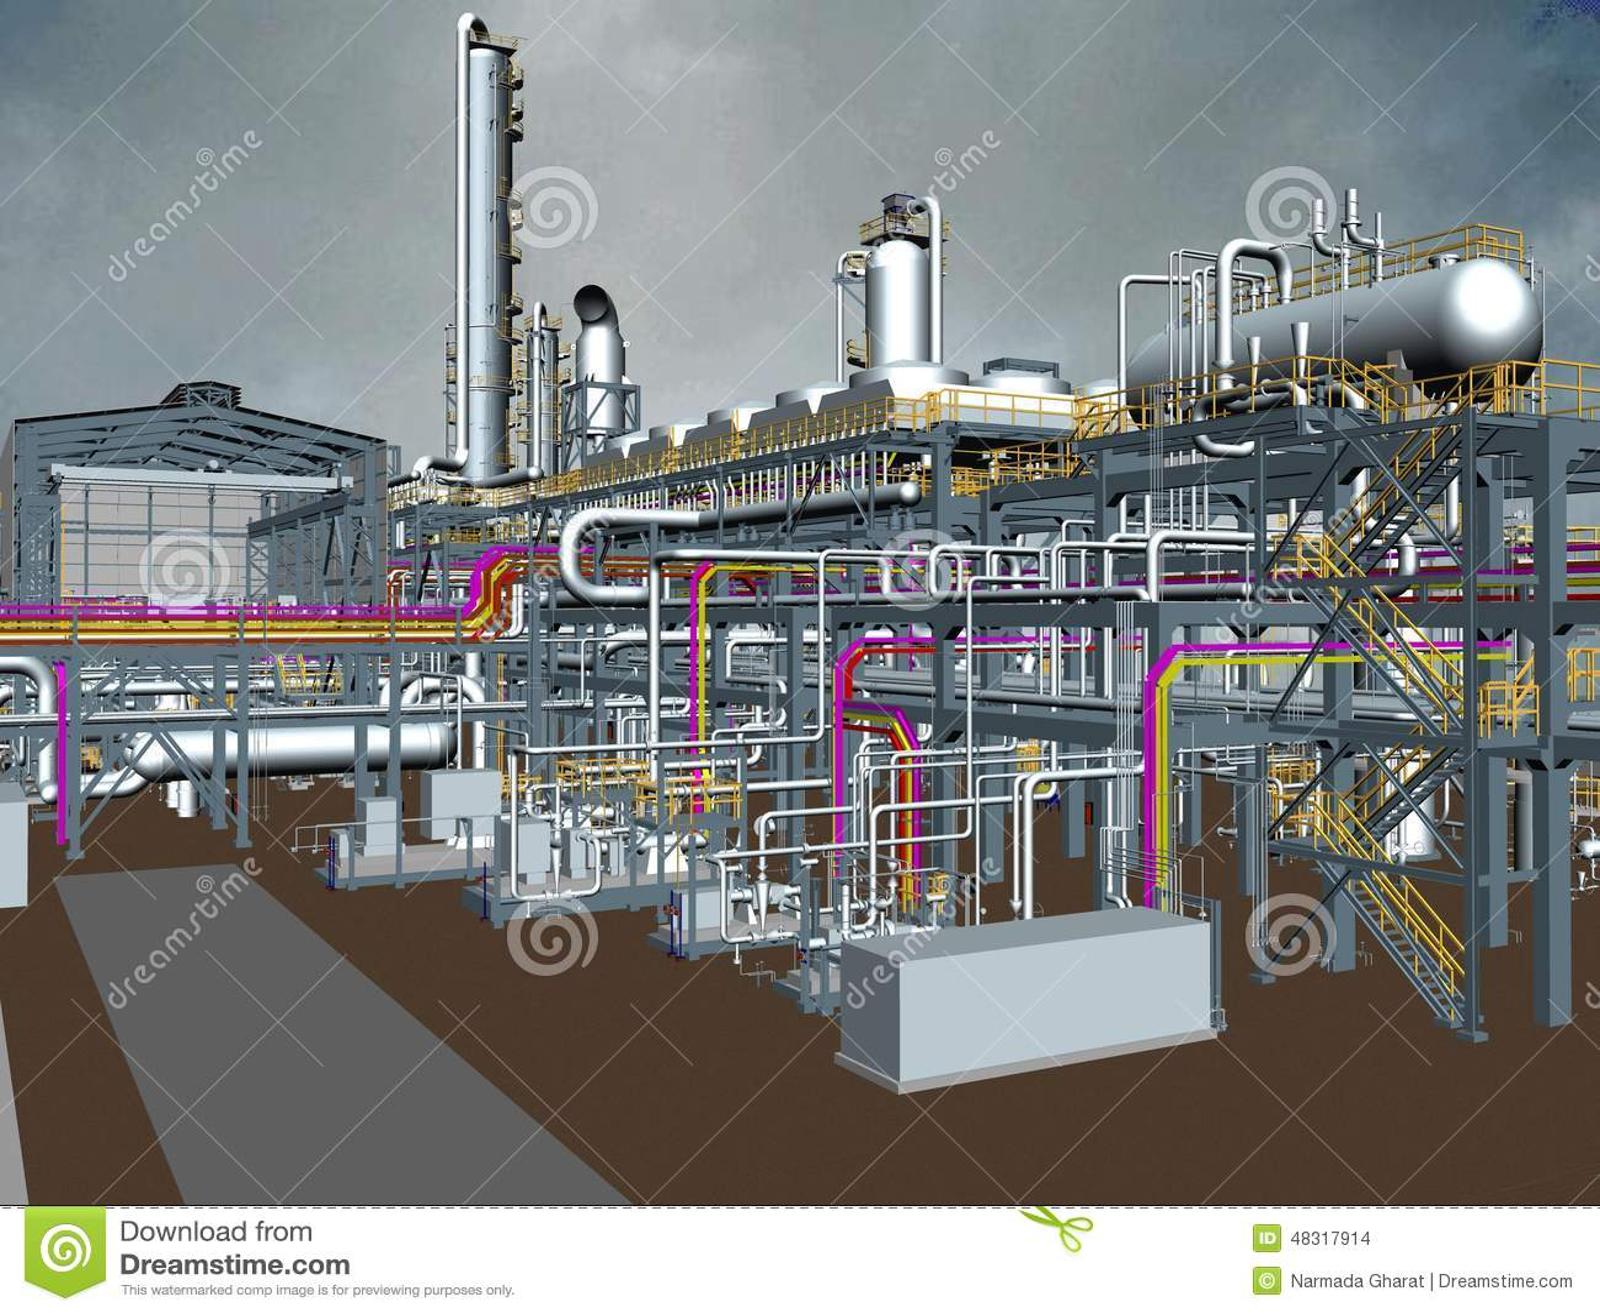 Oil Gas Plant 3d Model Design Stock Photo Image 48317914